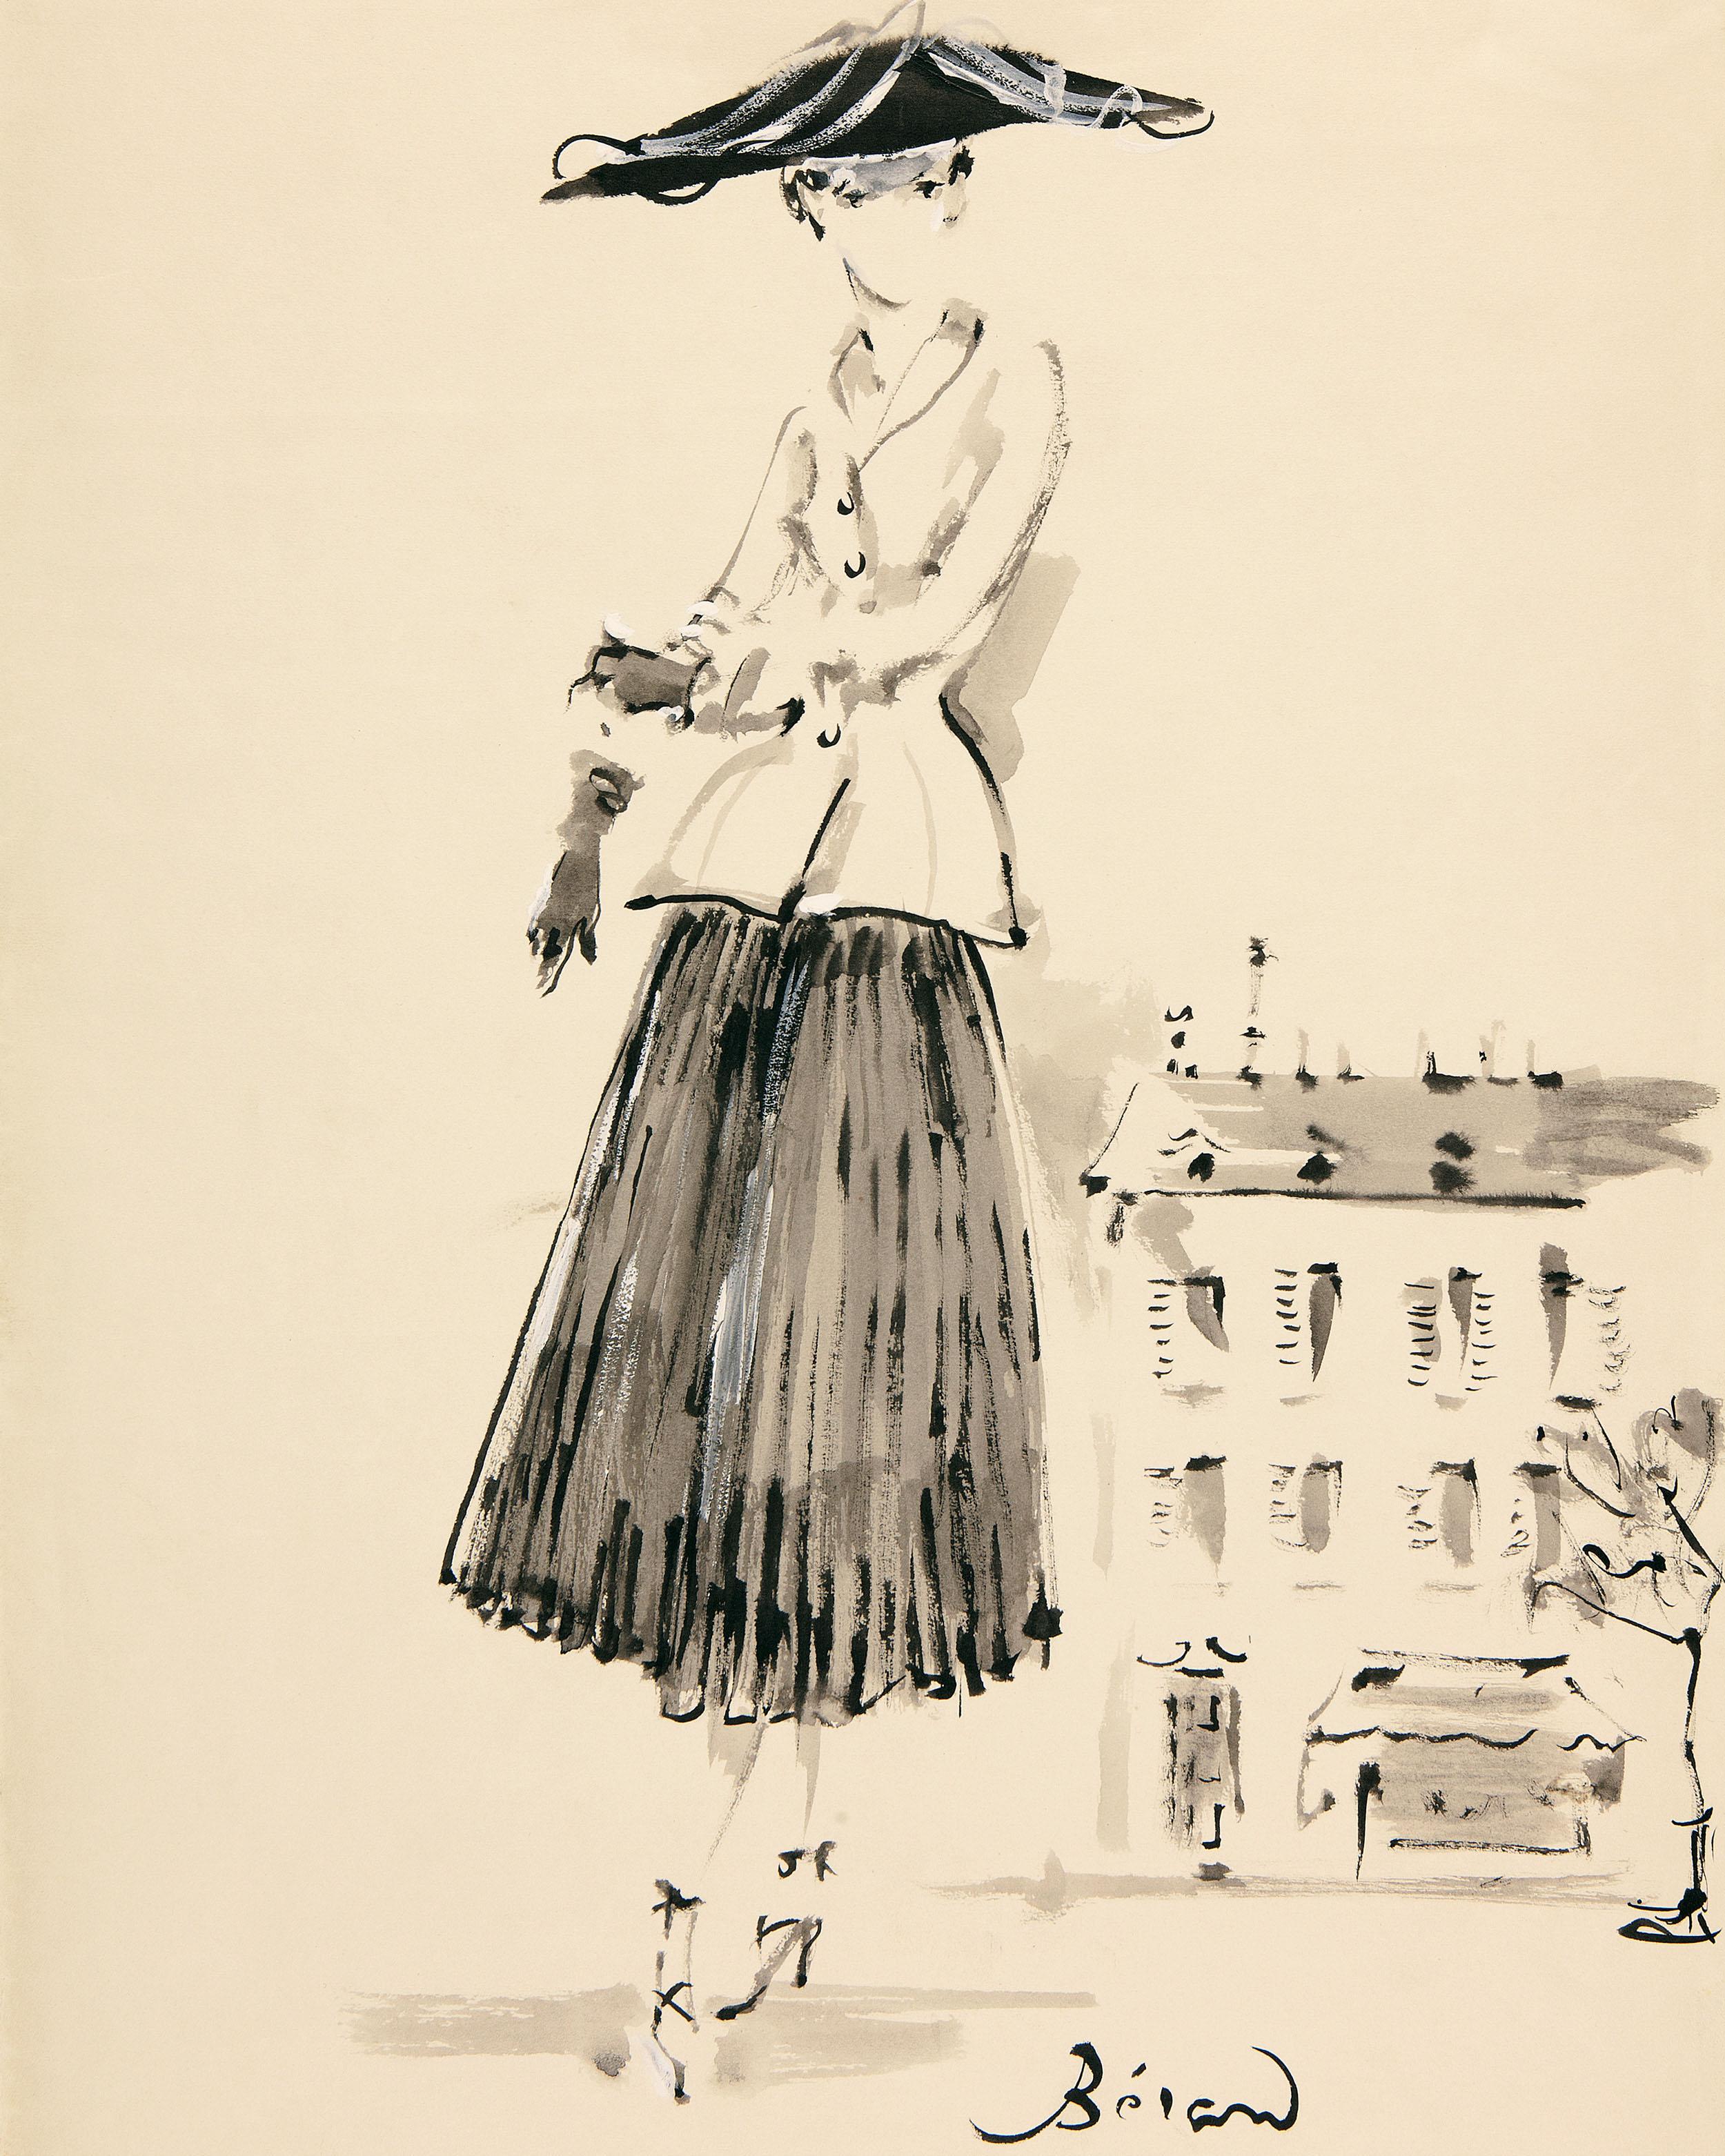 时装杂志_展览:Dior 迪奥 新风貌革命 – YESON FASHION